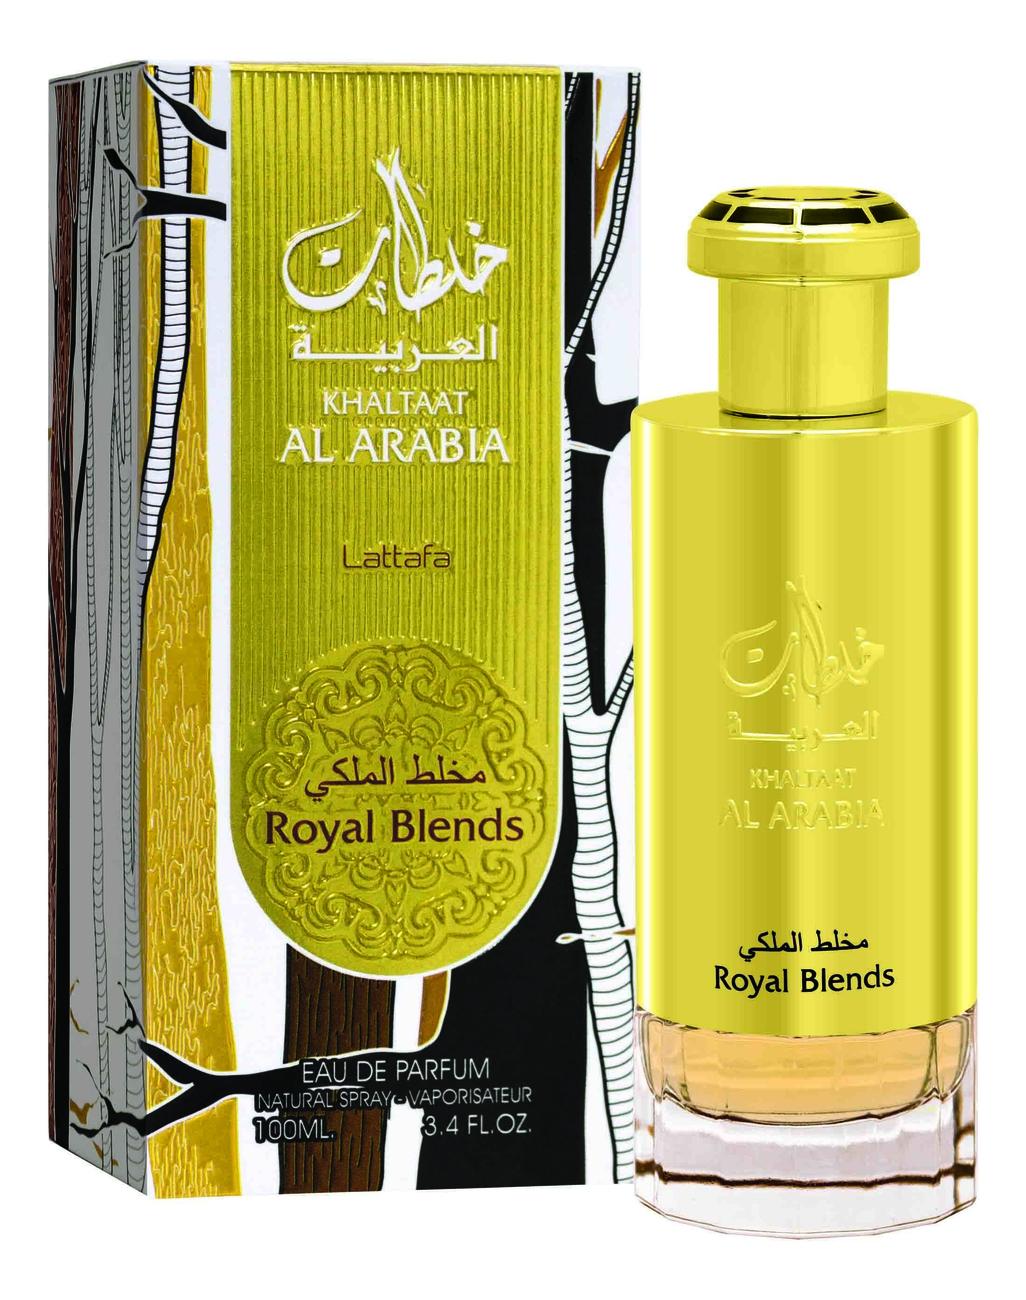 Lattafa Khaltaat Al Arabia Royal Blends: парфюмерная вода 100мл